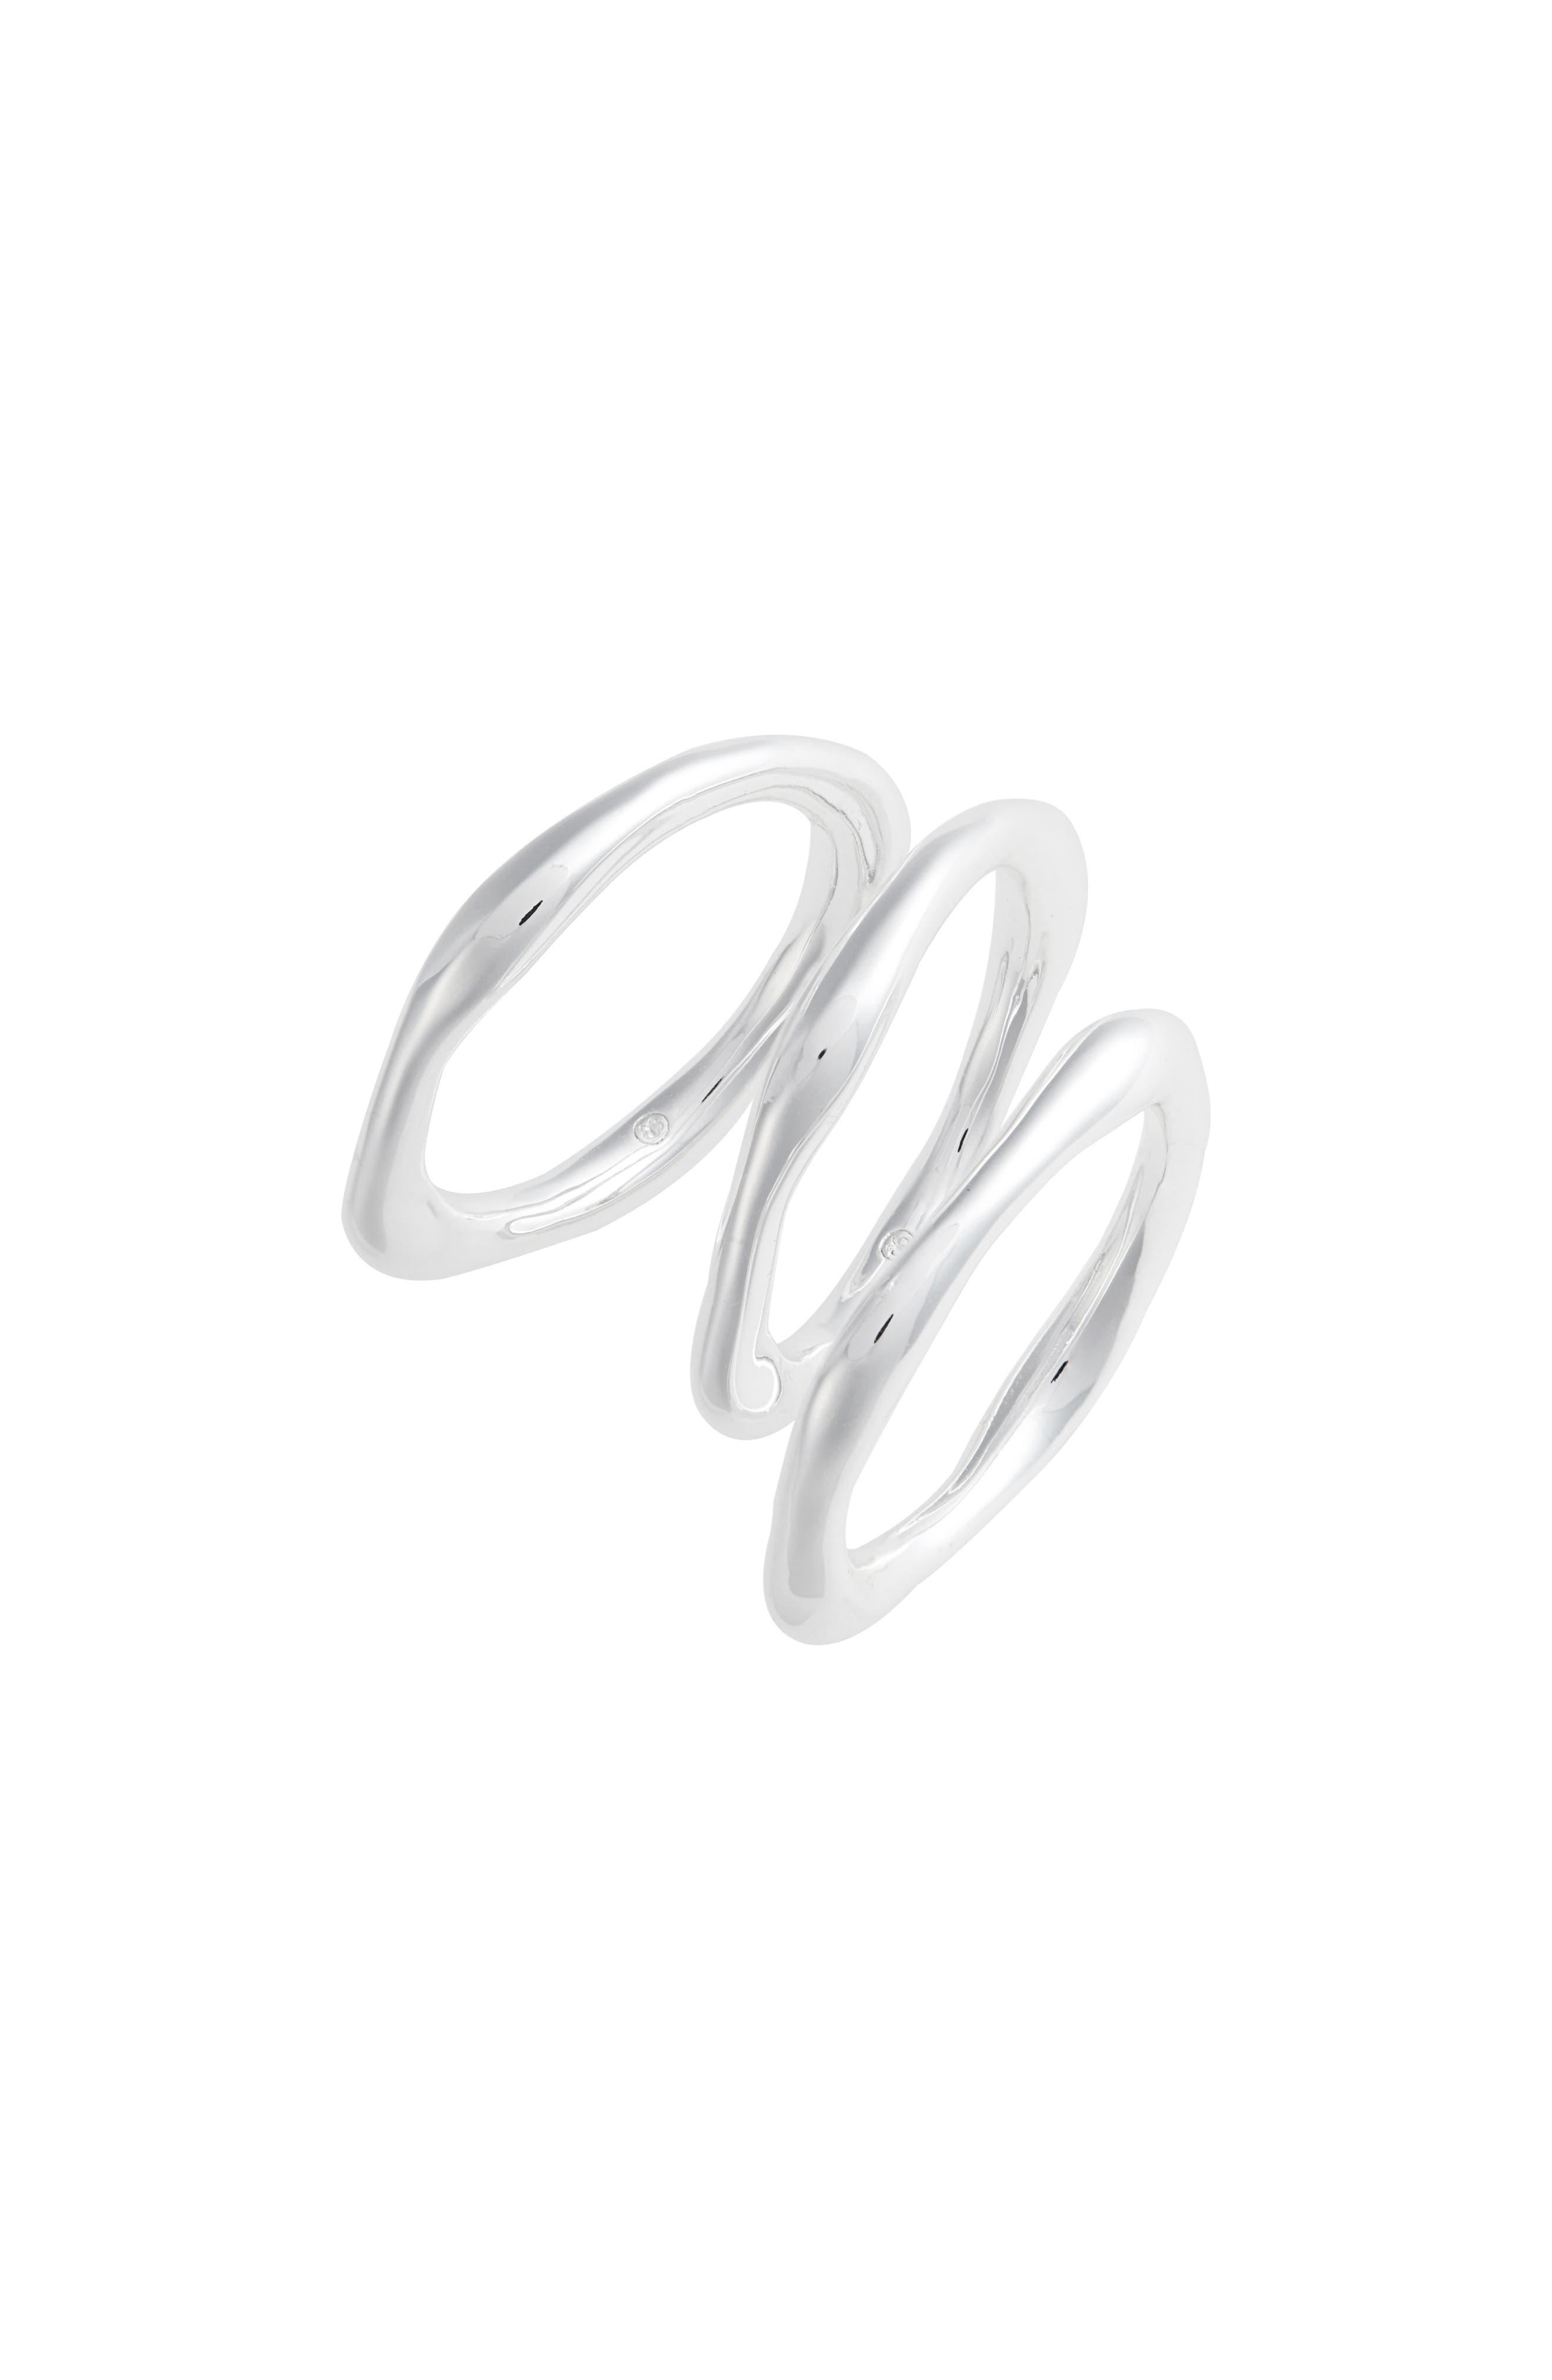 GORJANA,                             Quinn Set of 3 Rings,                             Main thumbnail 1, color,                             SILVER